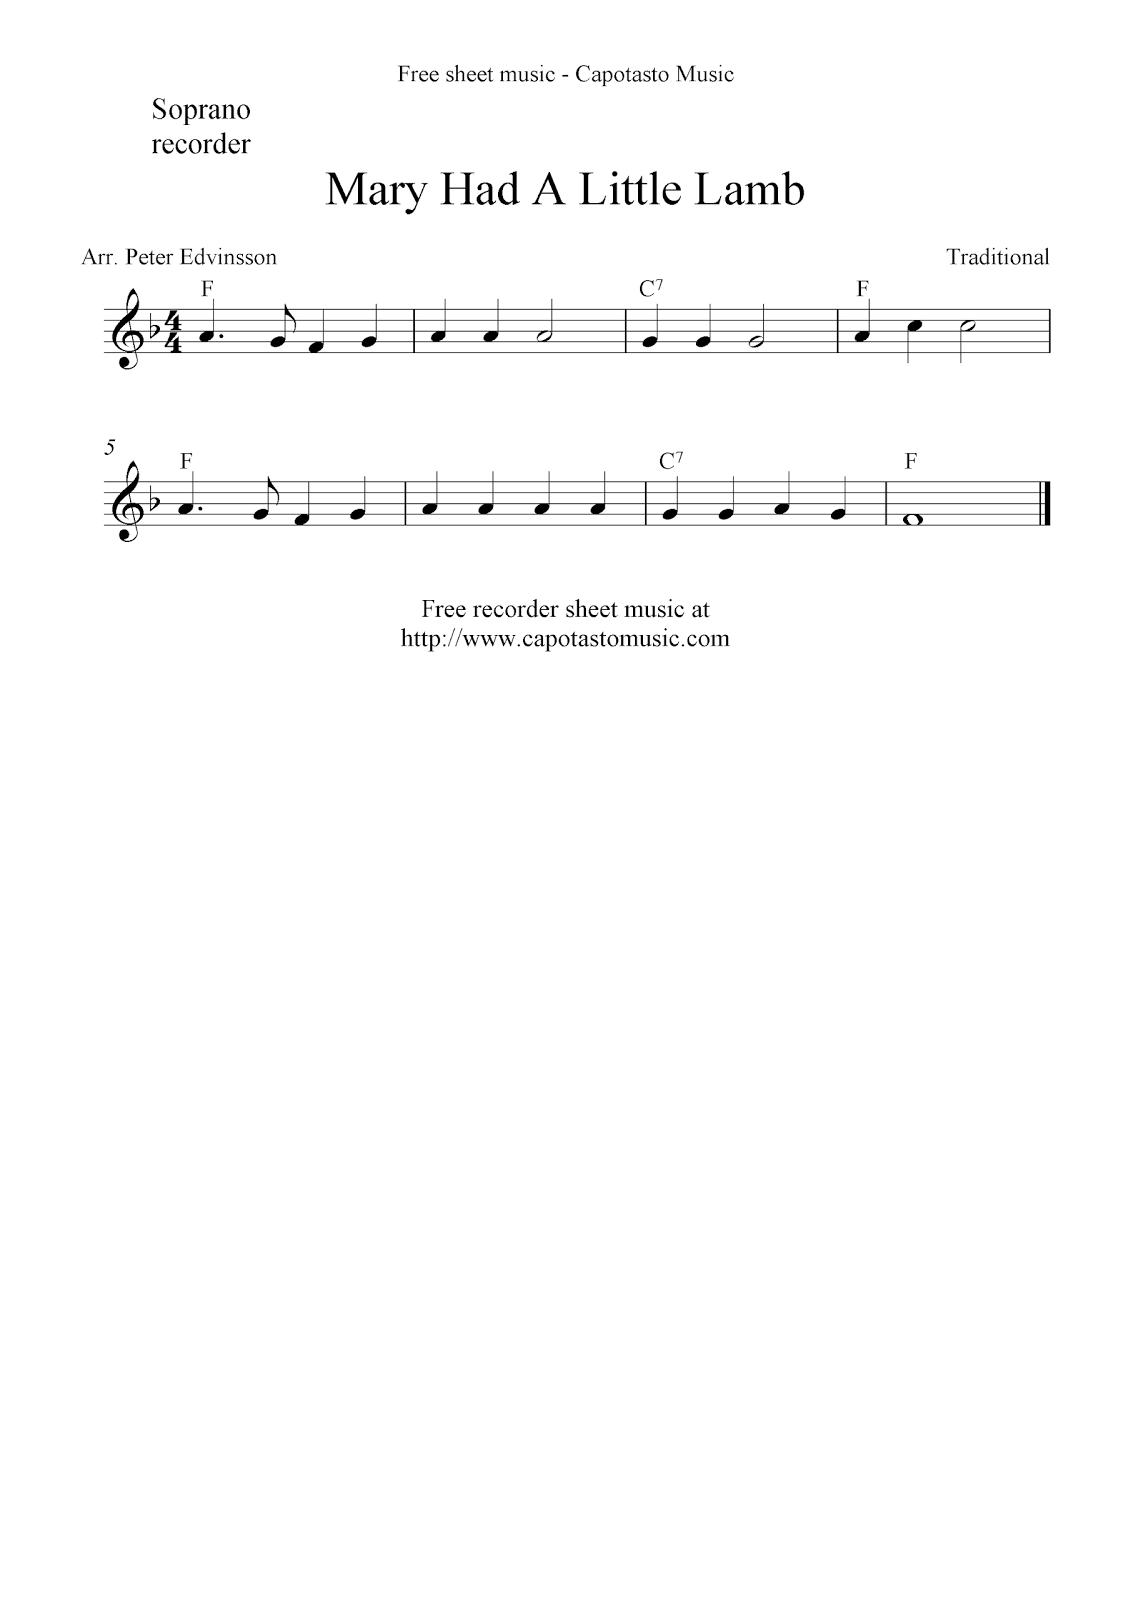 Mary Had A Little Lamb free soprano recorder sheet music notes